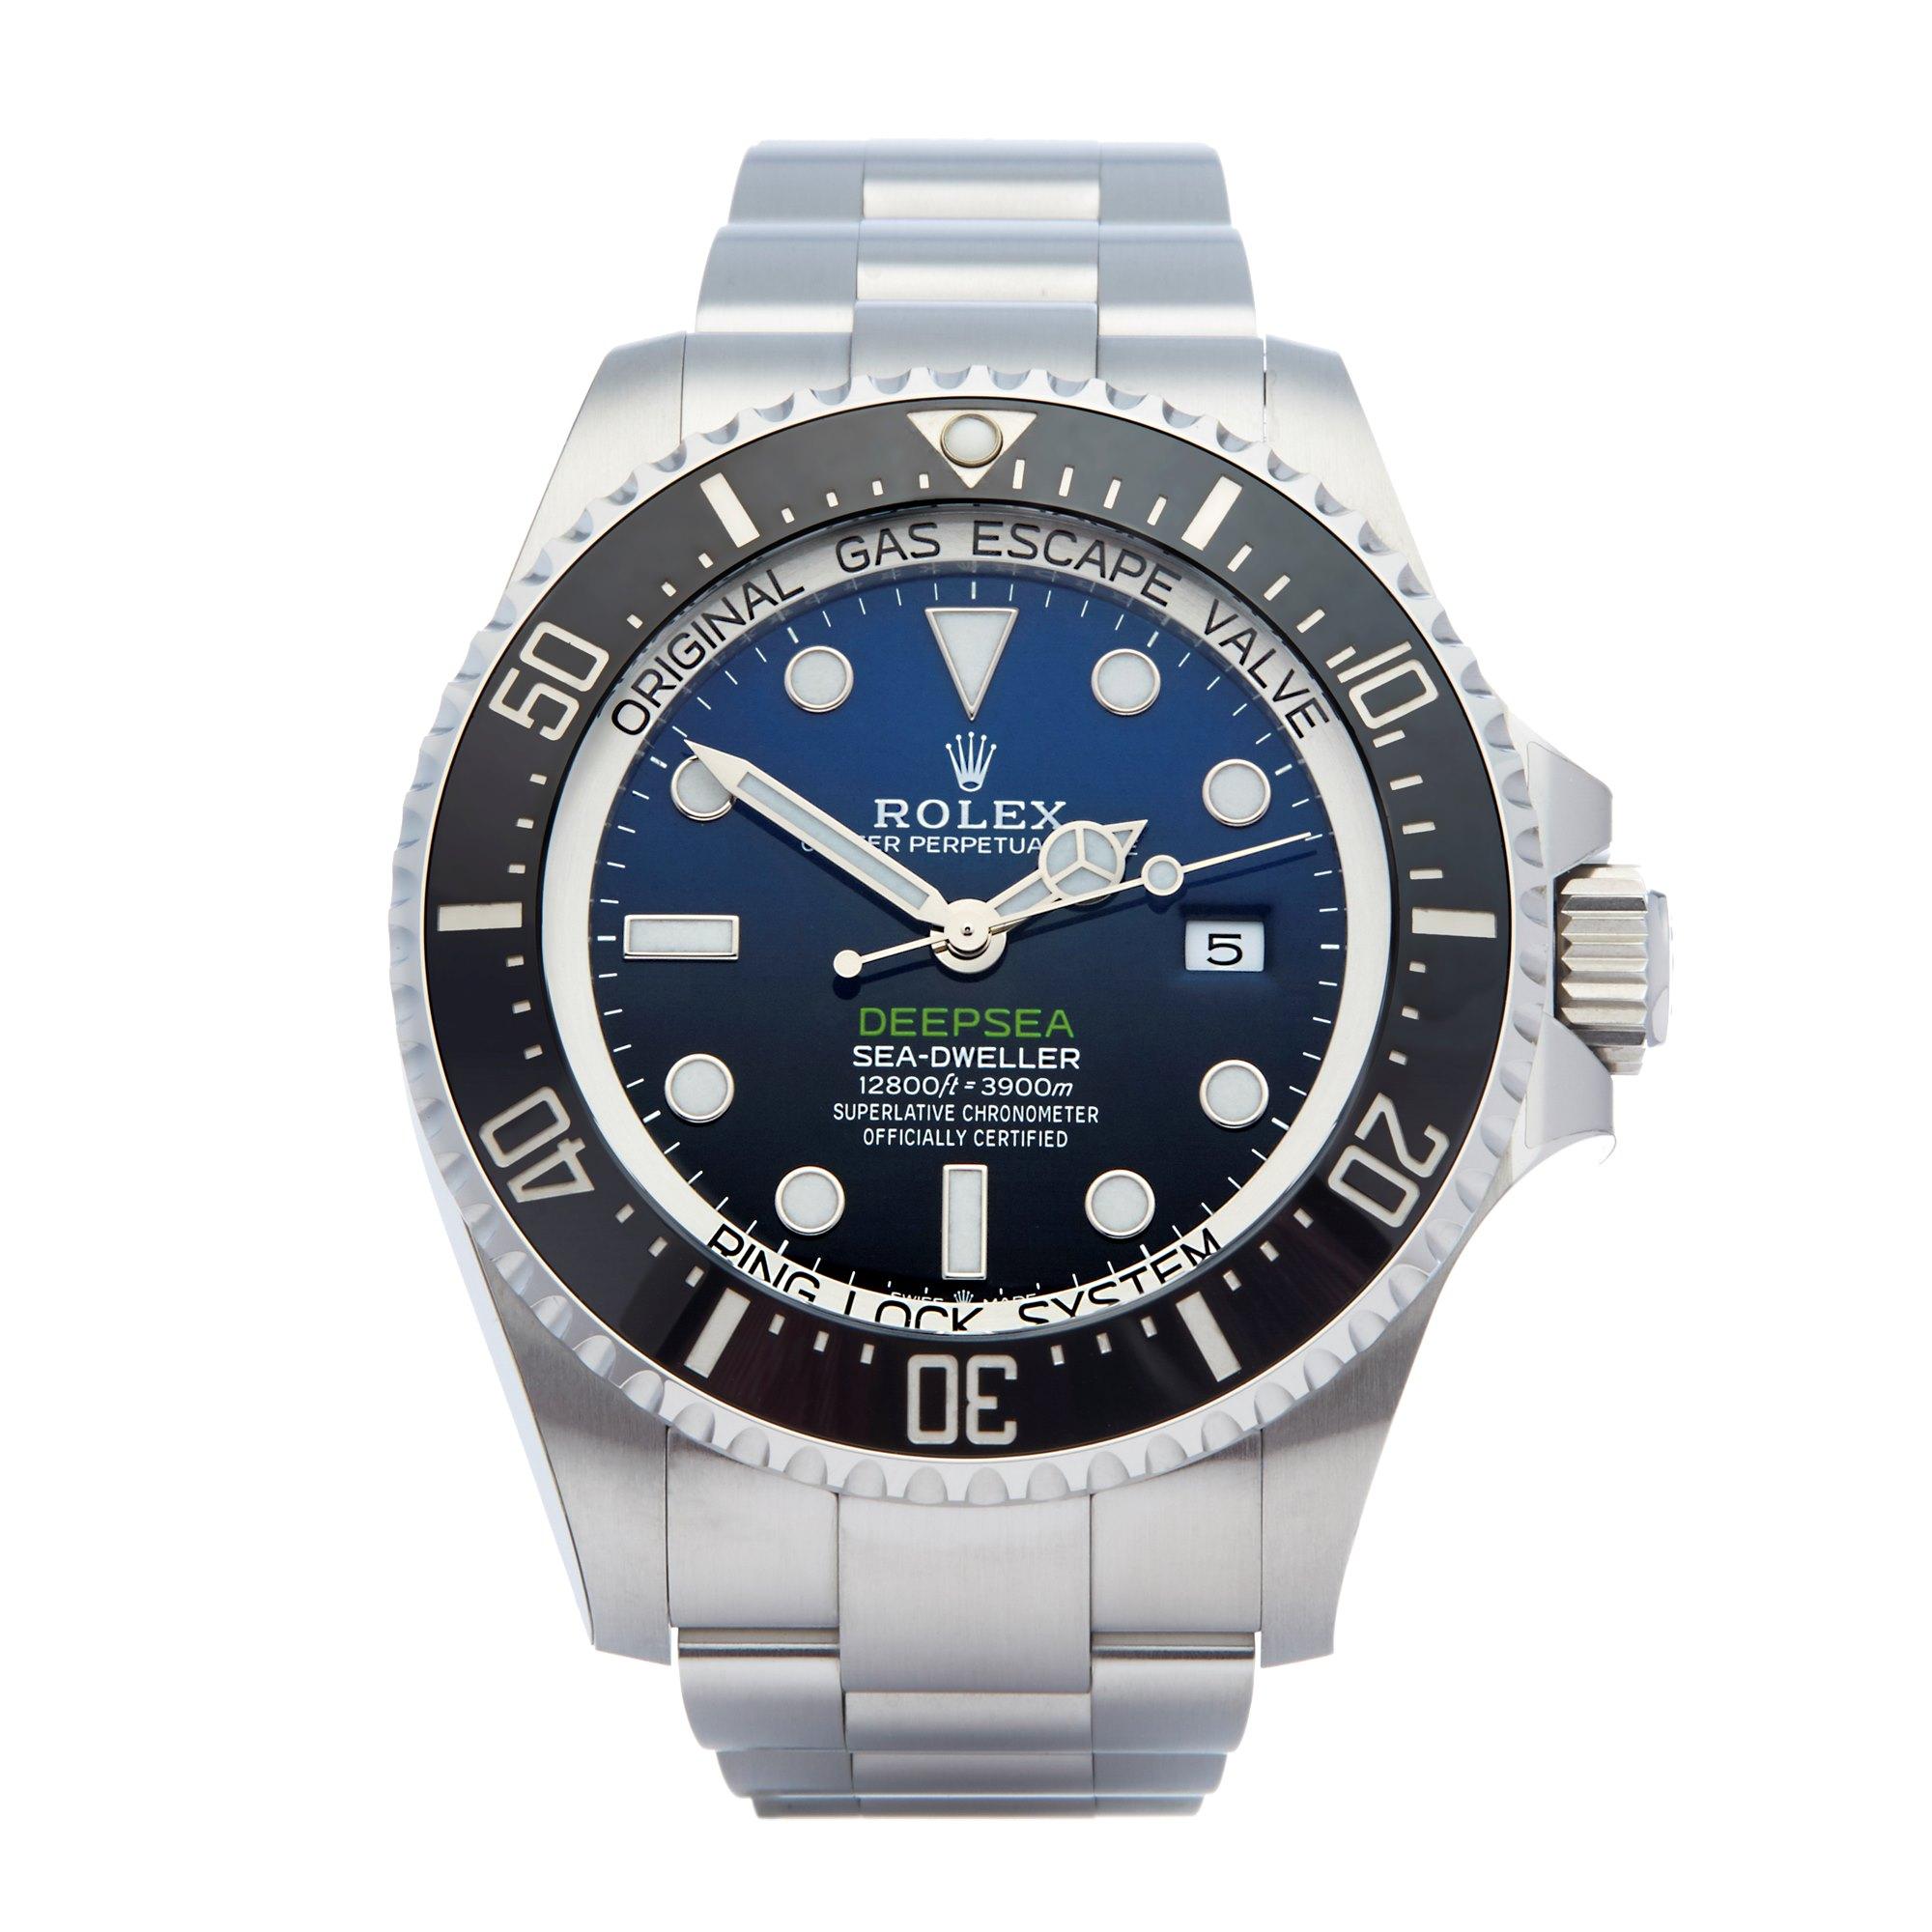 Rolex Sea-Dweller Deepsea James Cameron Stainless Steel 126660